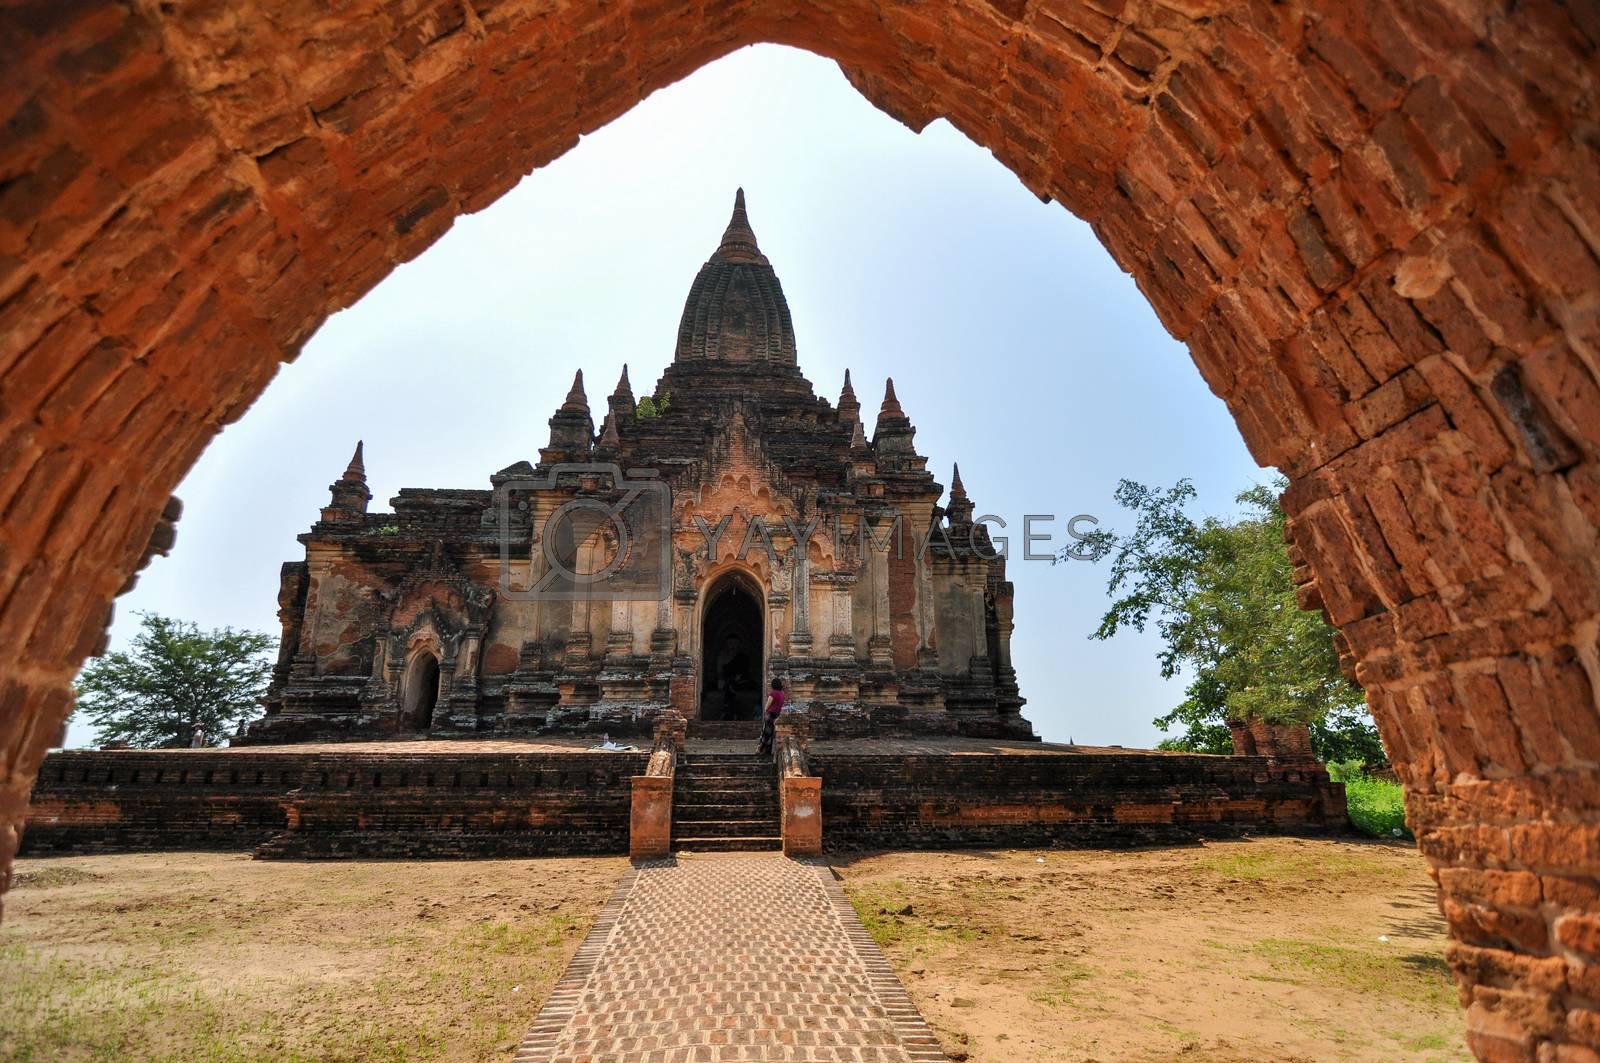 Royalty free image of Htilominlo temple, Bagan, Myanmar  by siraanamwong